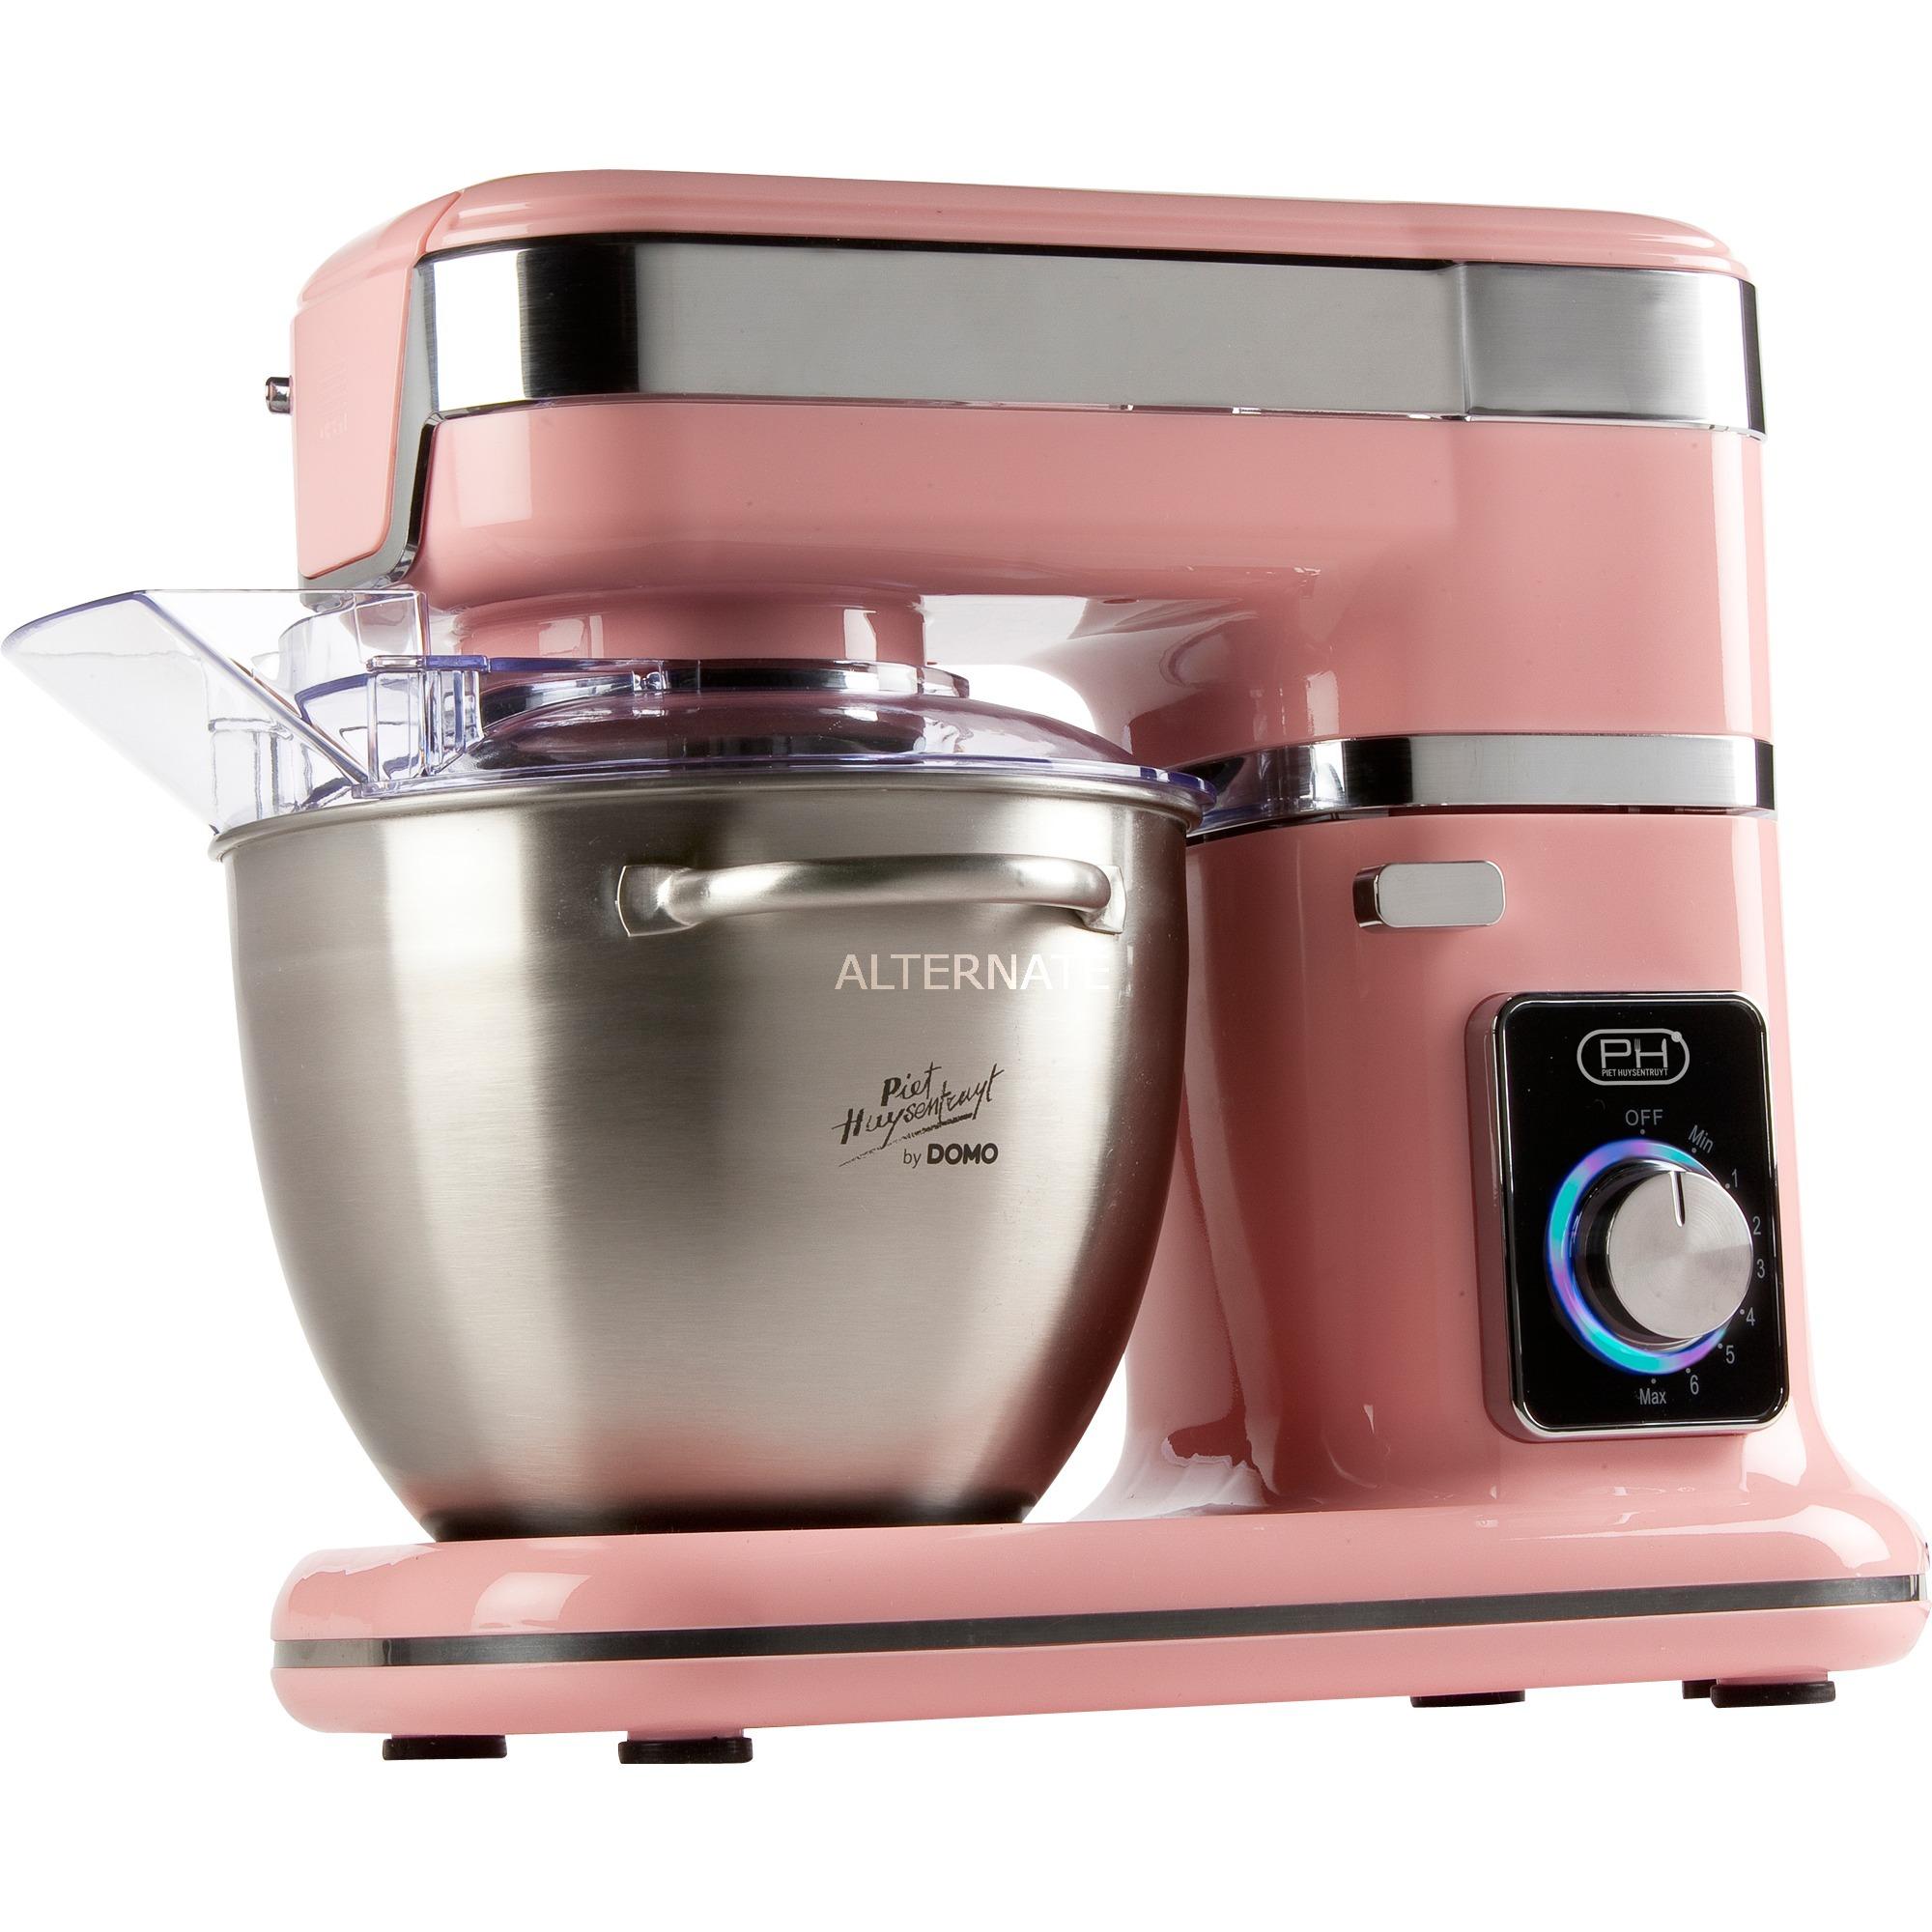 DO9114KR 1000W 4.5L Rosa, Acero inoxidable robot de cocina